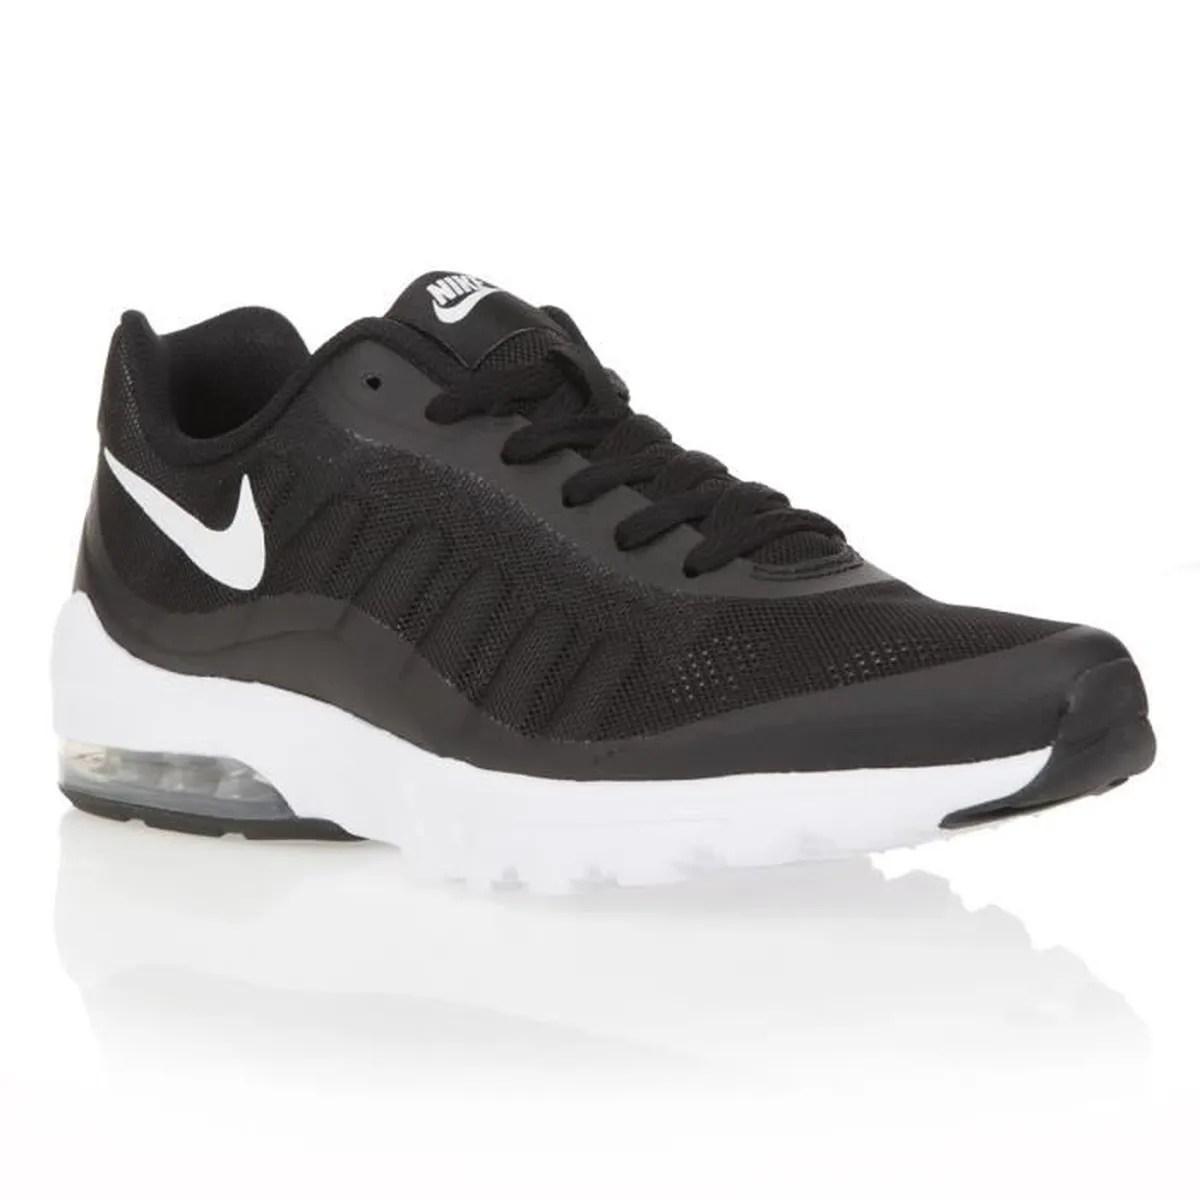 Meuble A Chaussures Nike   Chaussures De Running Fille Nike ... 3796815cca81